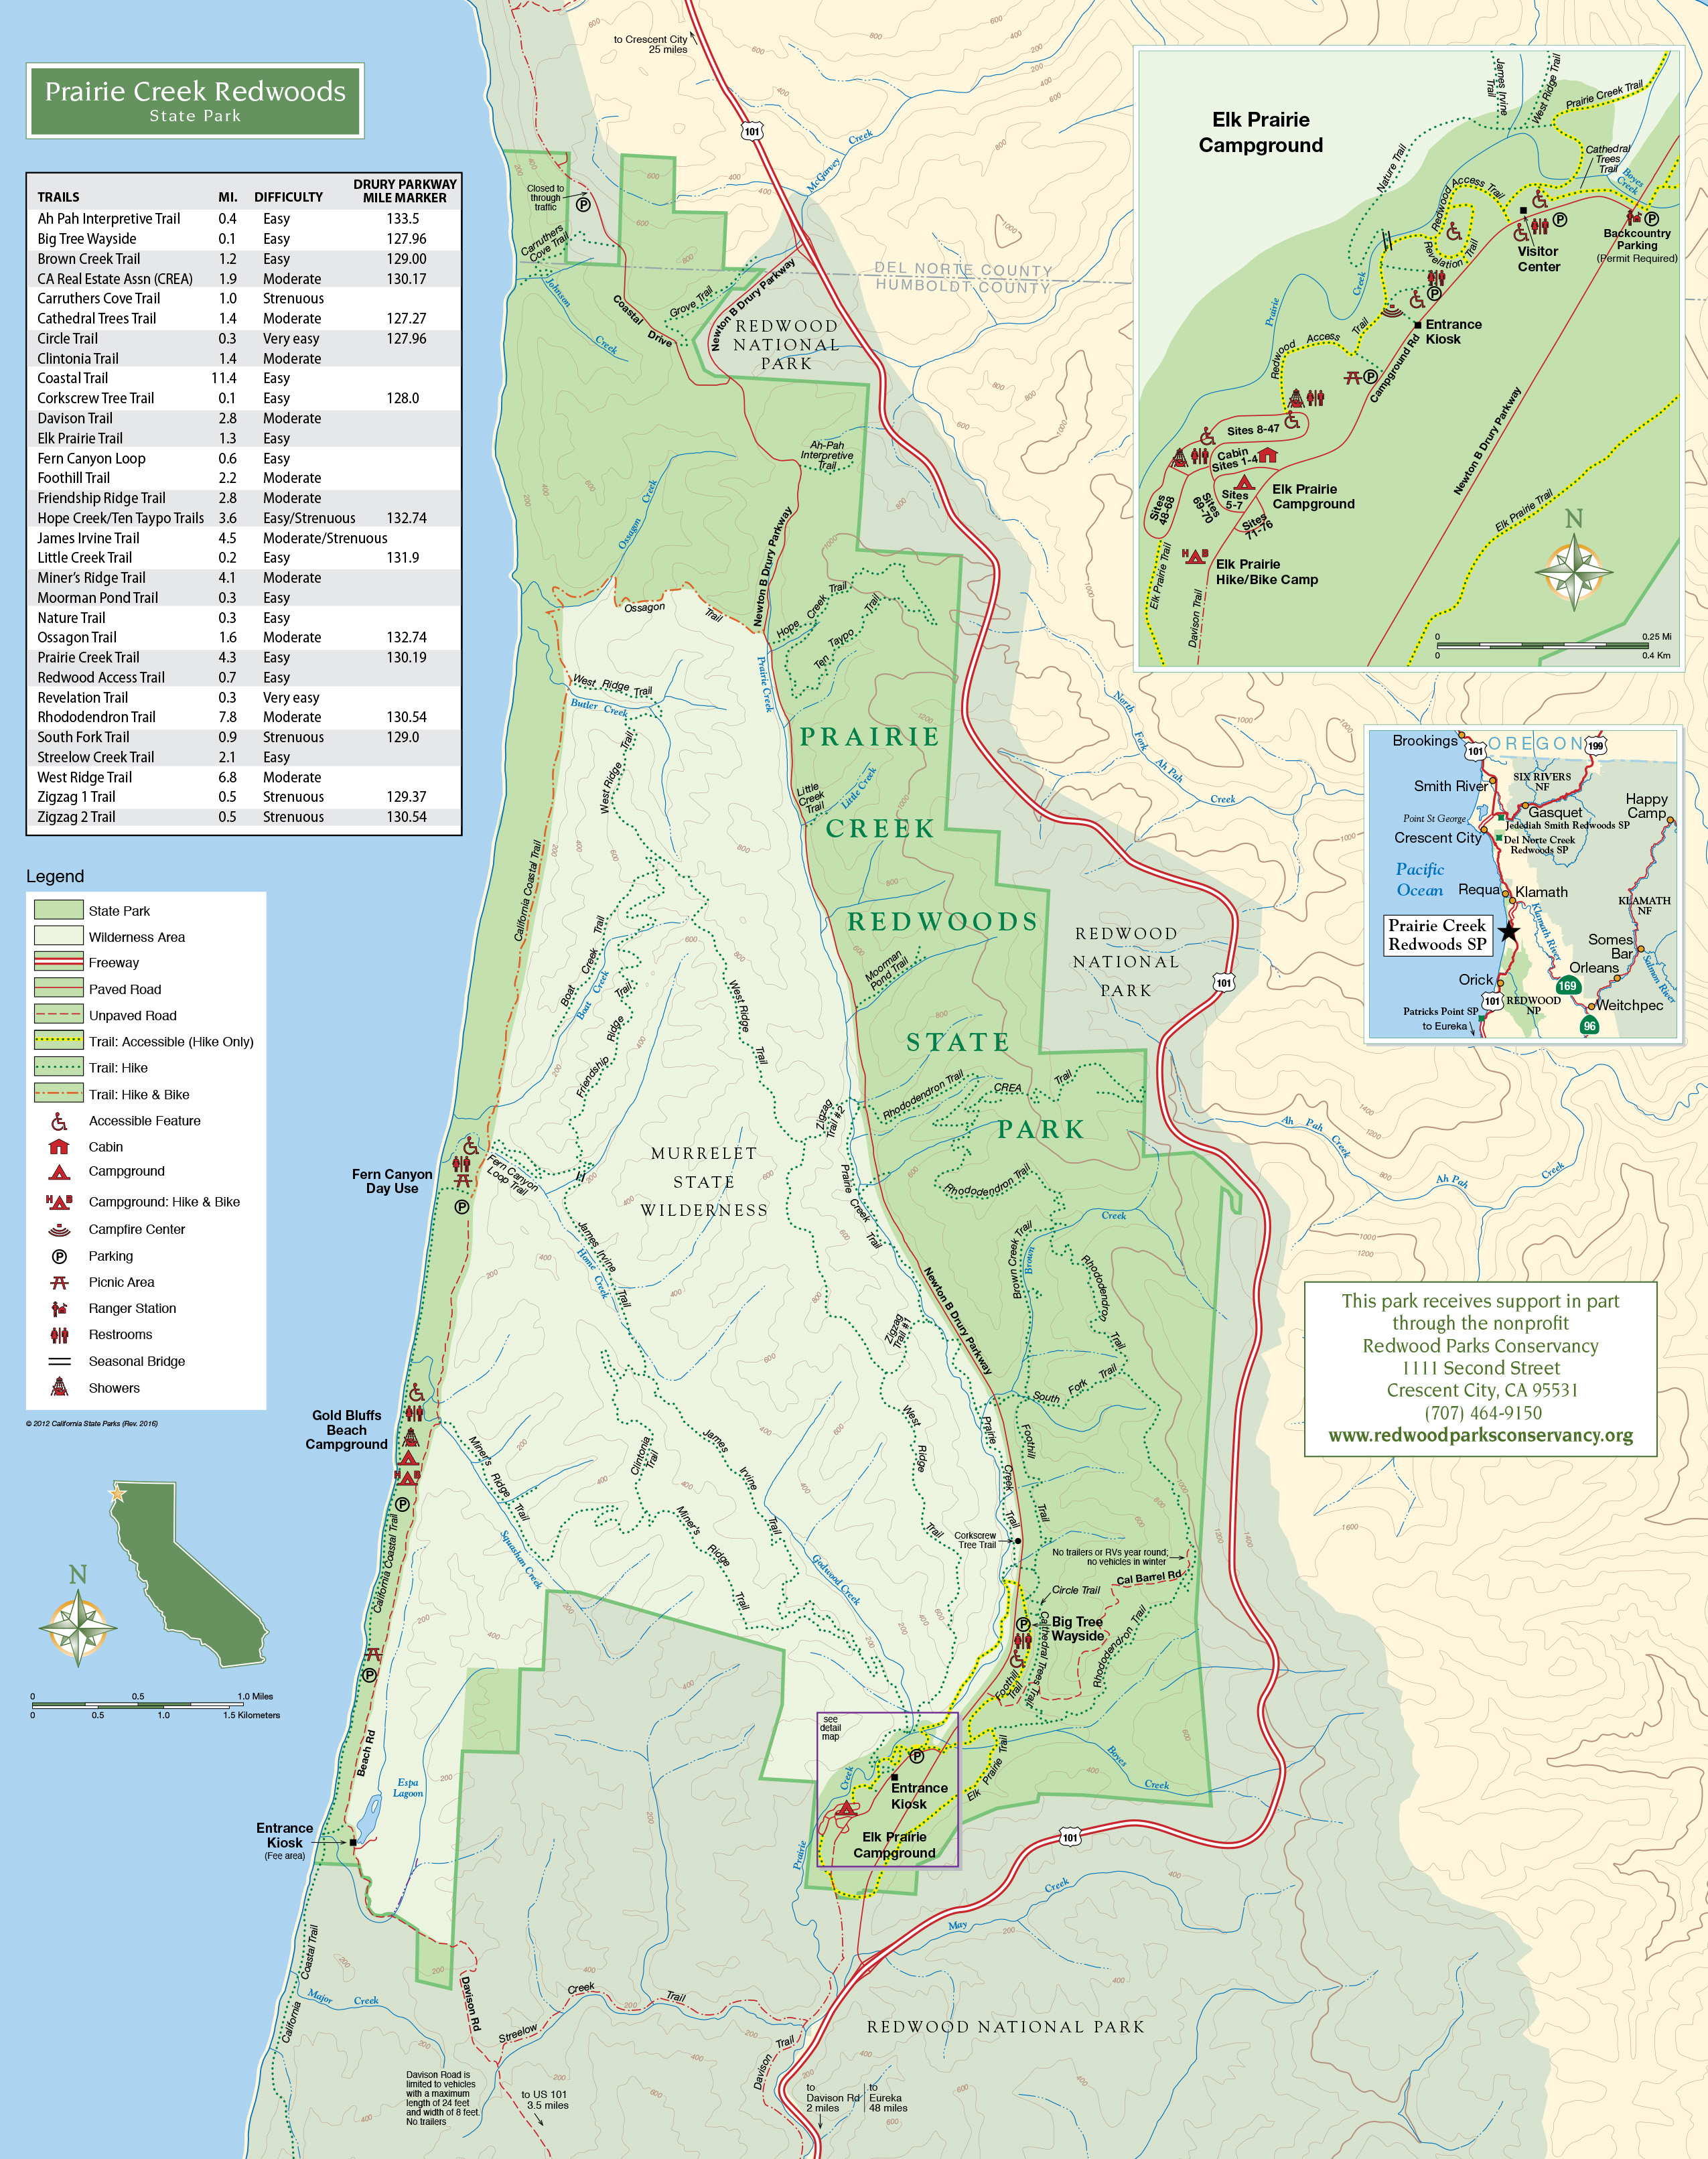 Prairie Creek Trails | Redwood Parks Conservancy on